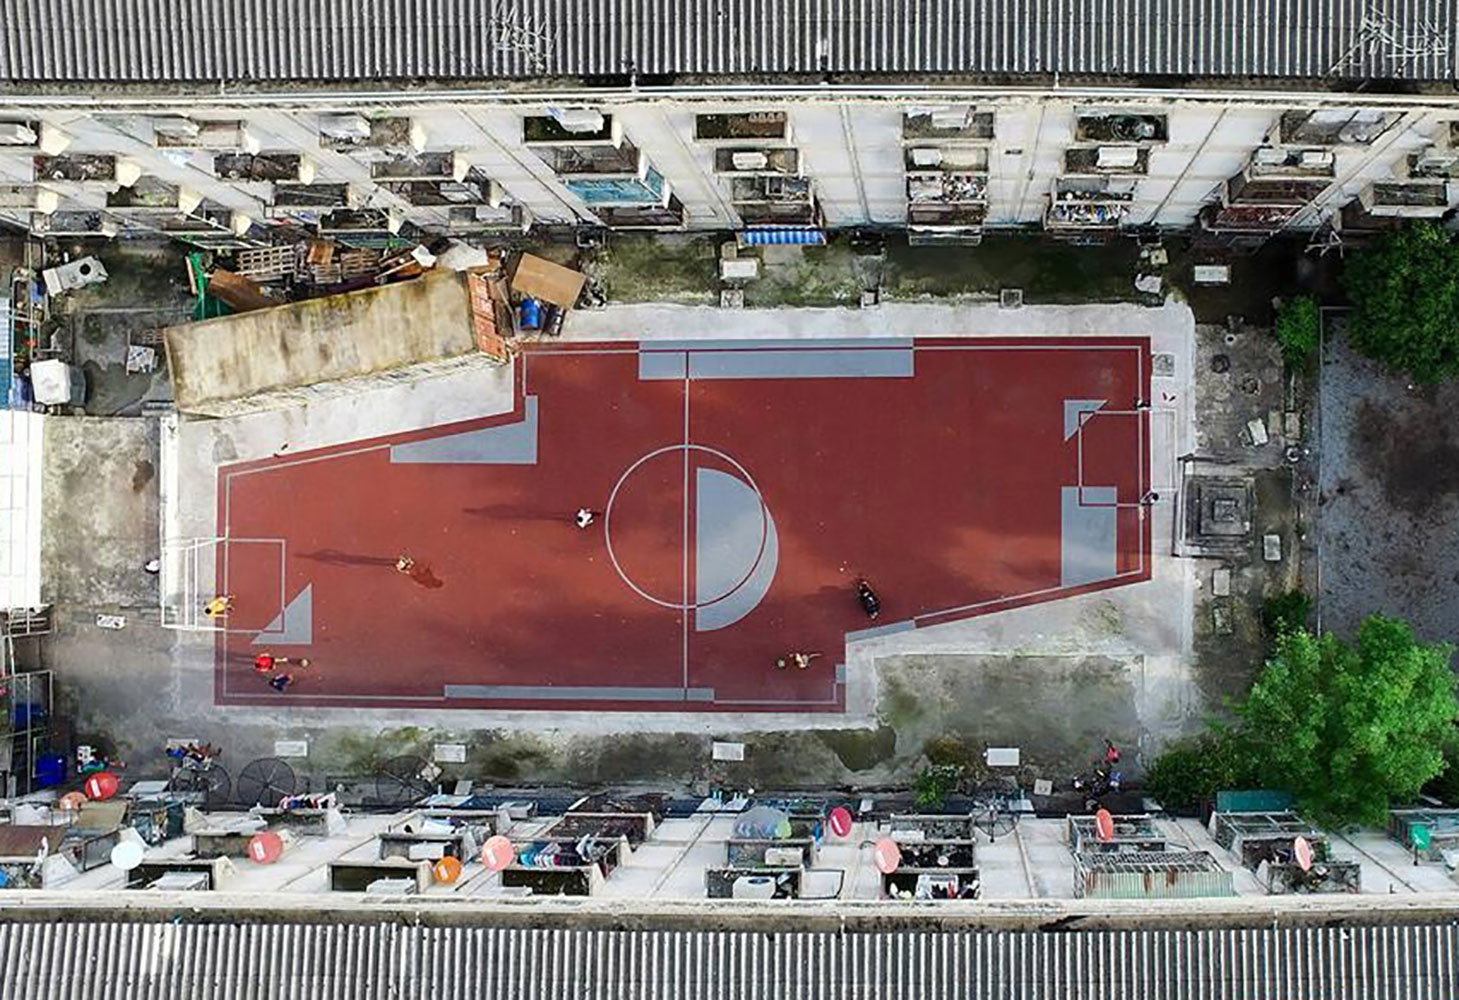 Diagonal football field in Bangkok Thailand